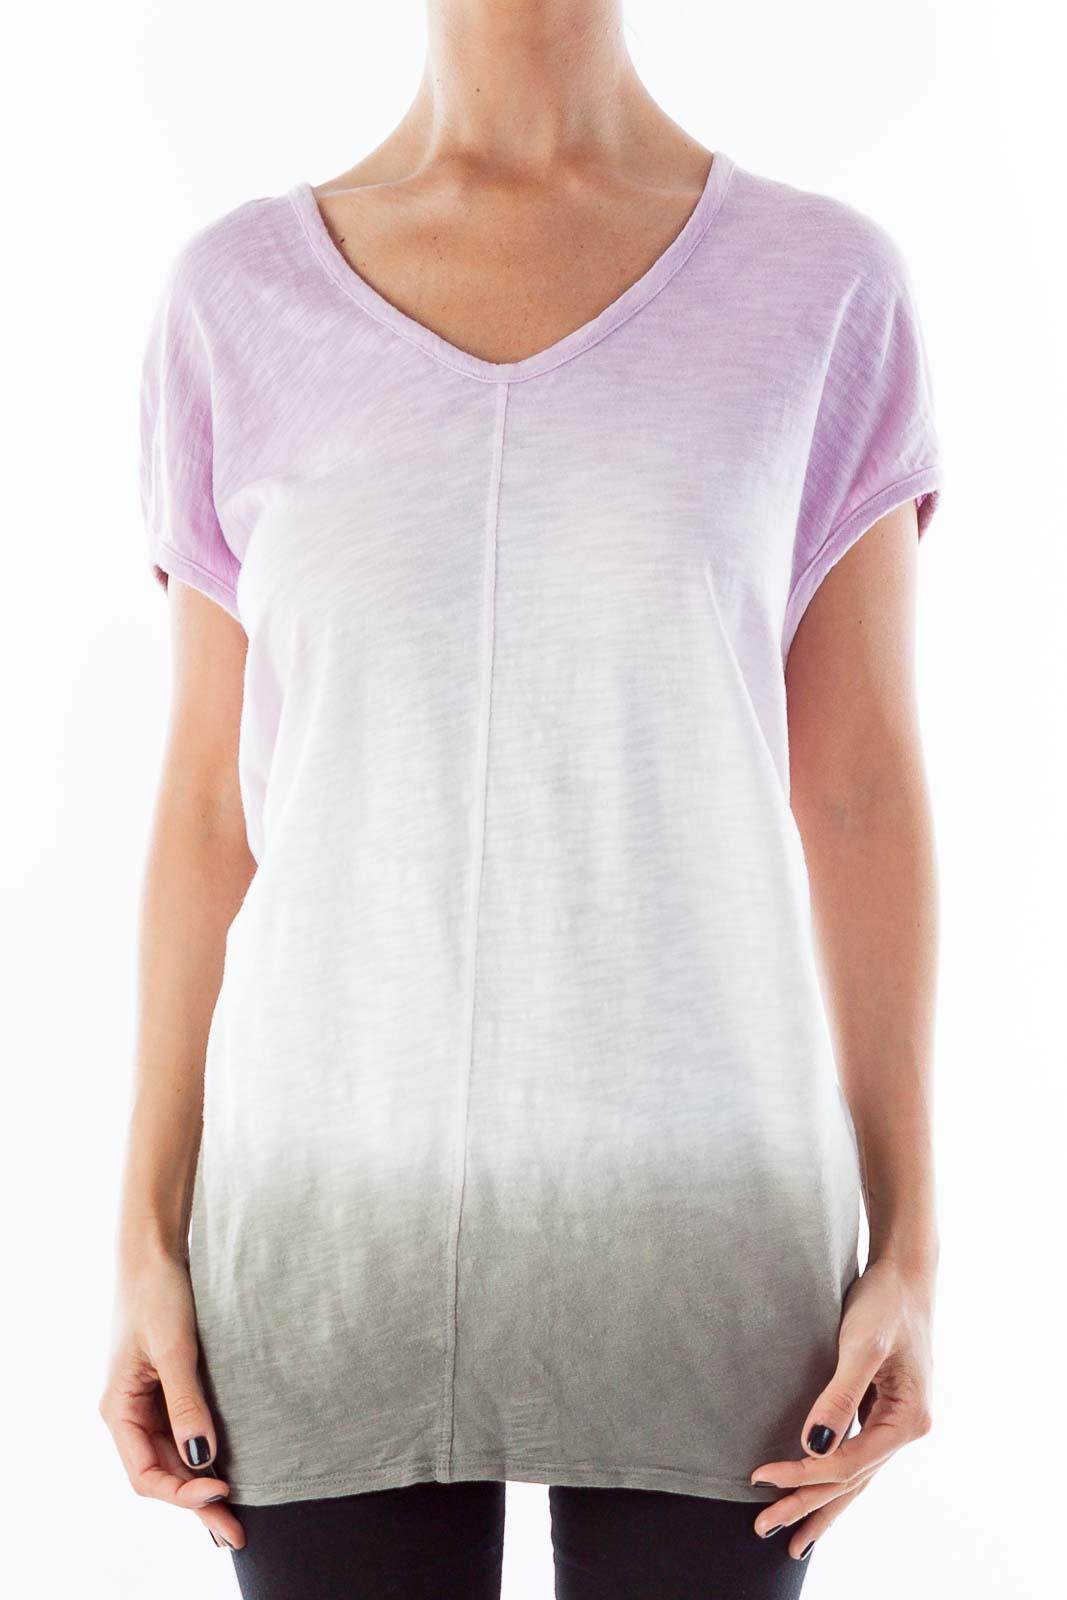 Purple & Grey Oversize Top